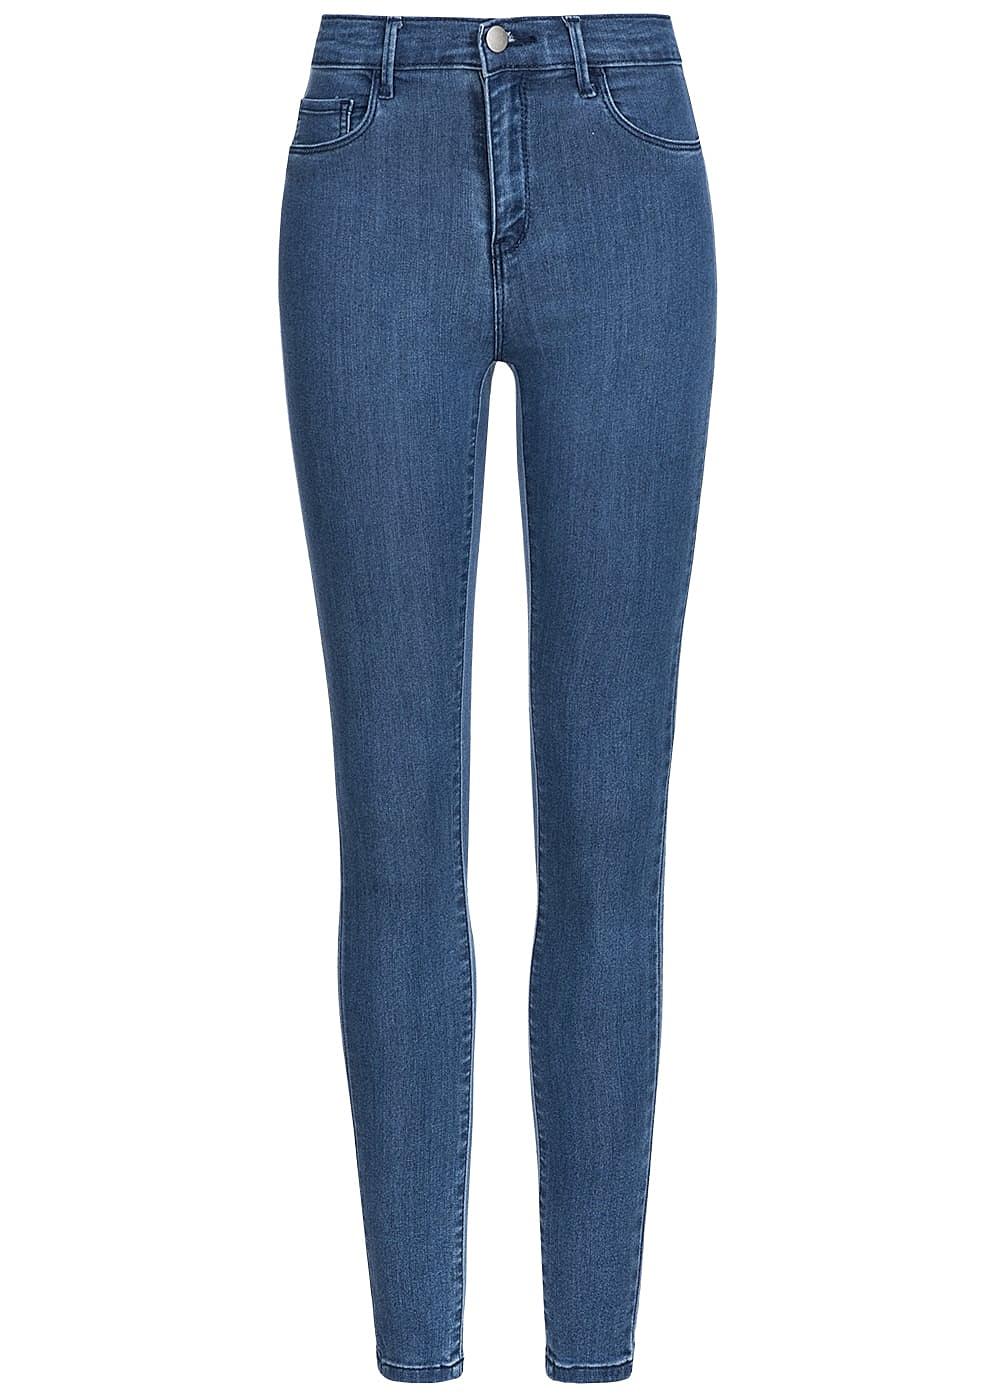 only damen skinny jeans deko taschen vorne regular waist noos medium blau denim 77onlineshop. Black Bedroom Furniture Sets. Home Design Ideas